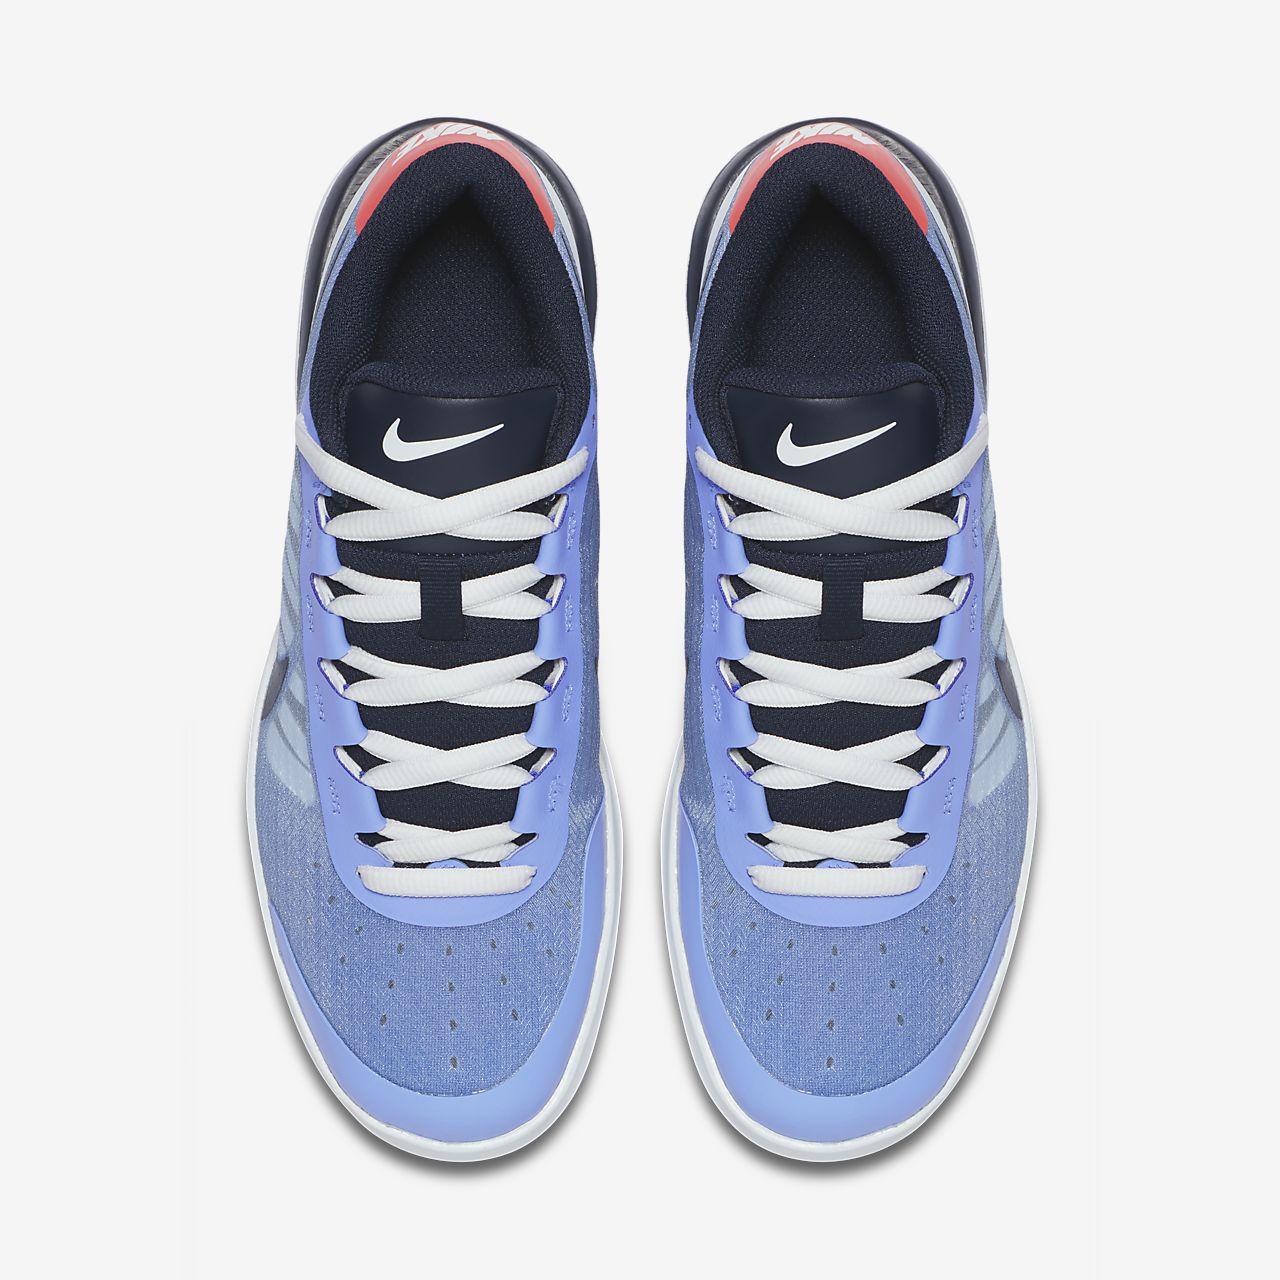 Scarpa da tennis NikeCourt Air Max Vapor Wing MS Donna